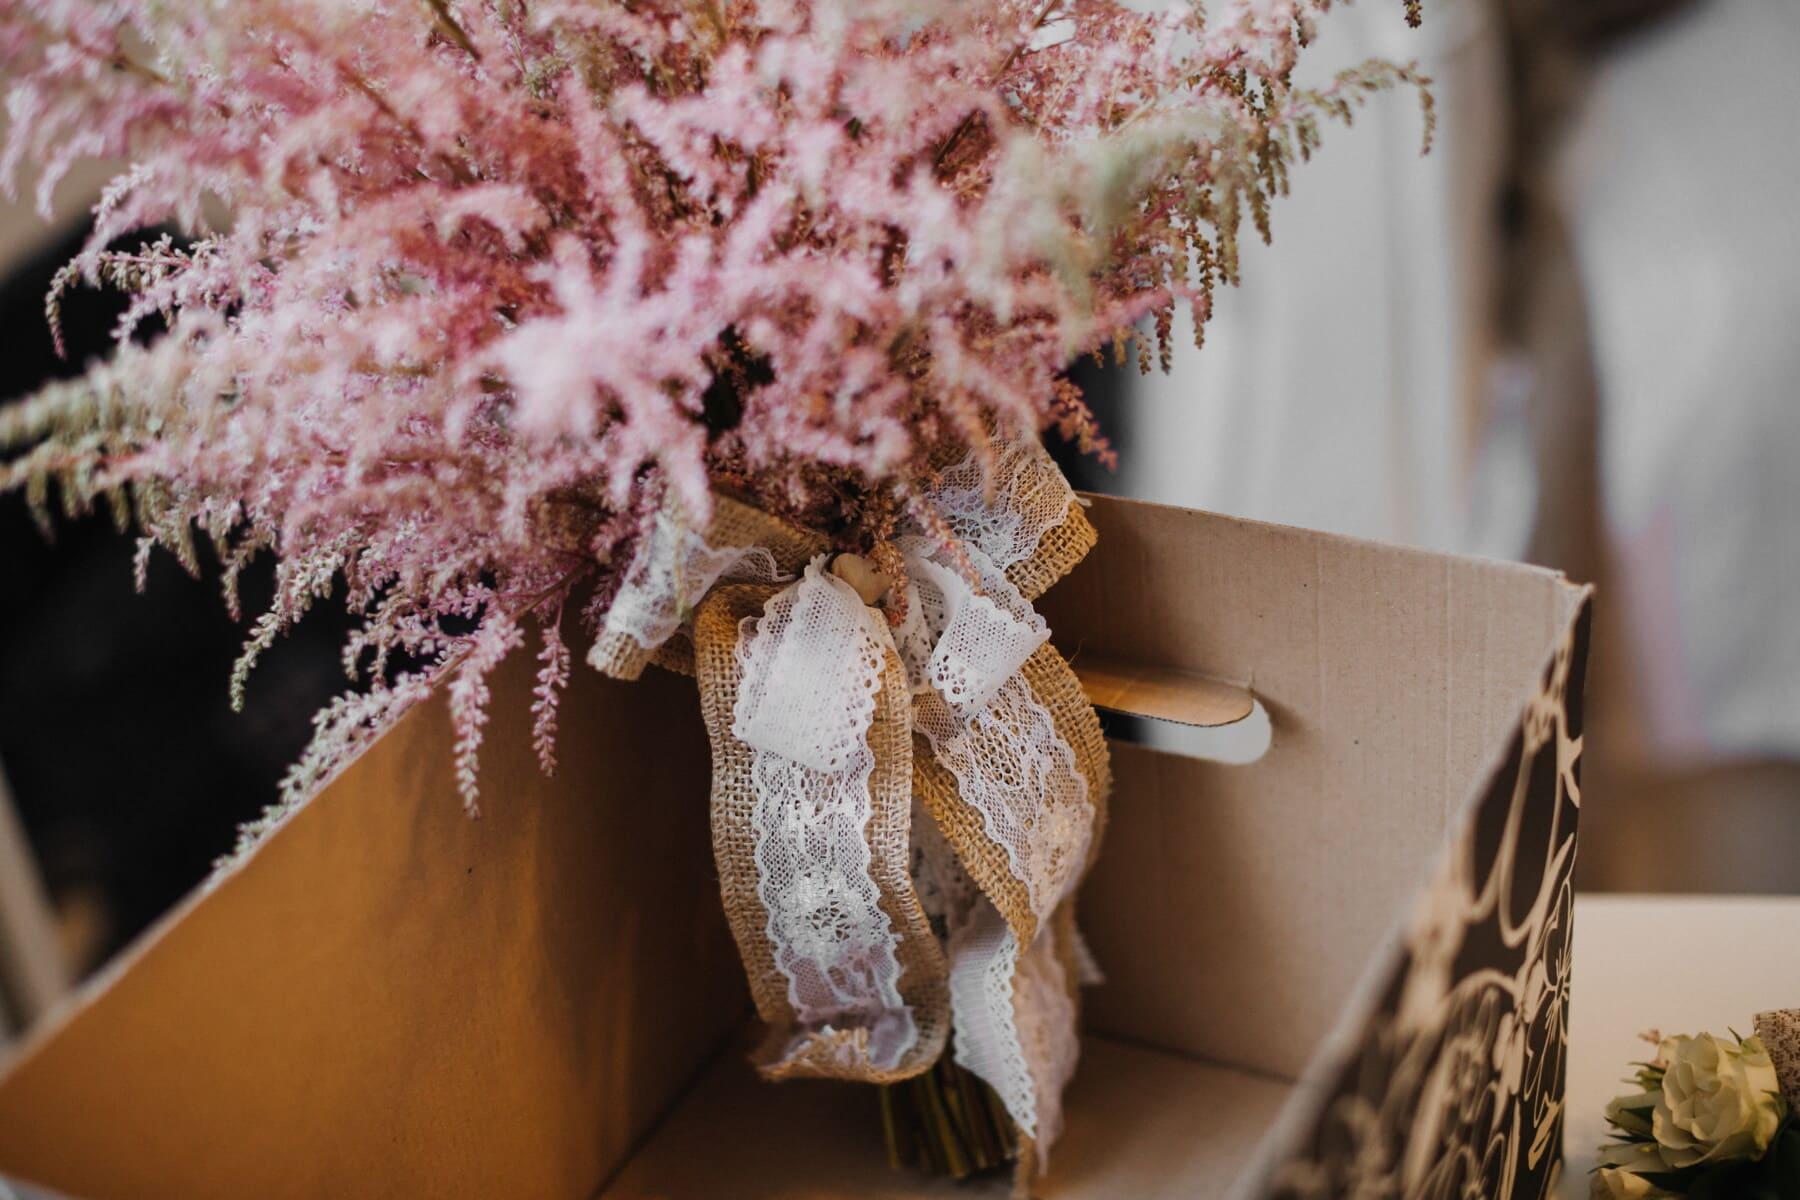 pinkish, homemade, bouquet, vintage, box, carton, flower, still life, light, nature